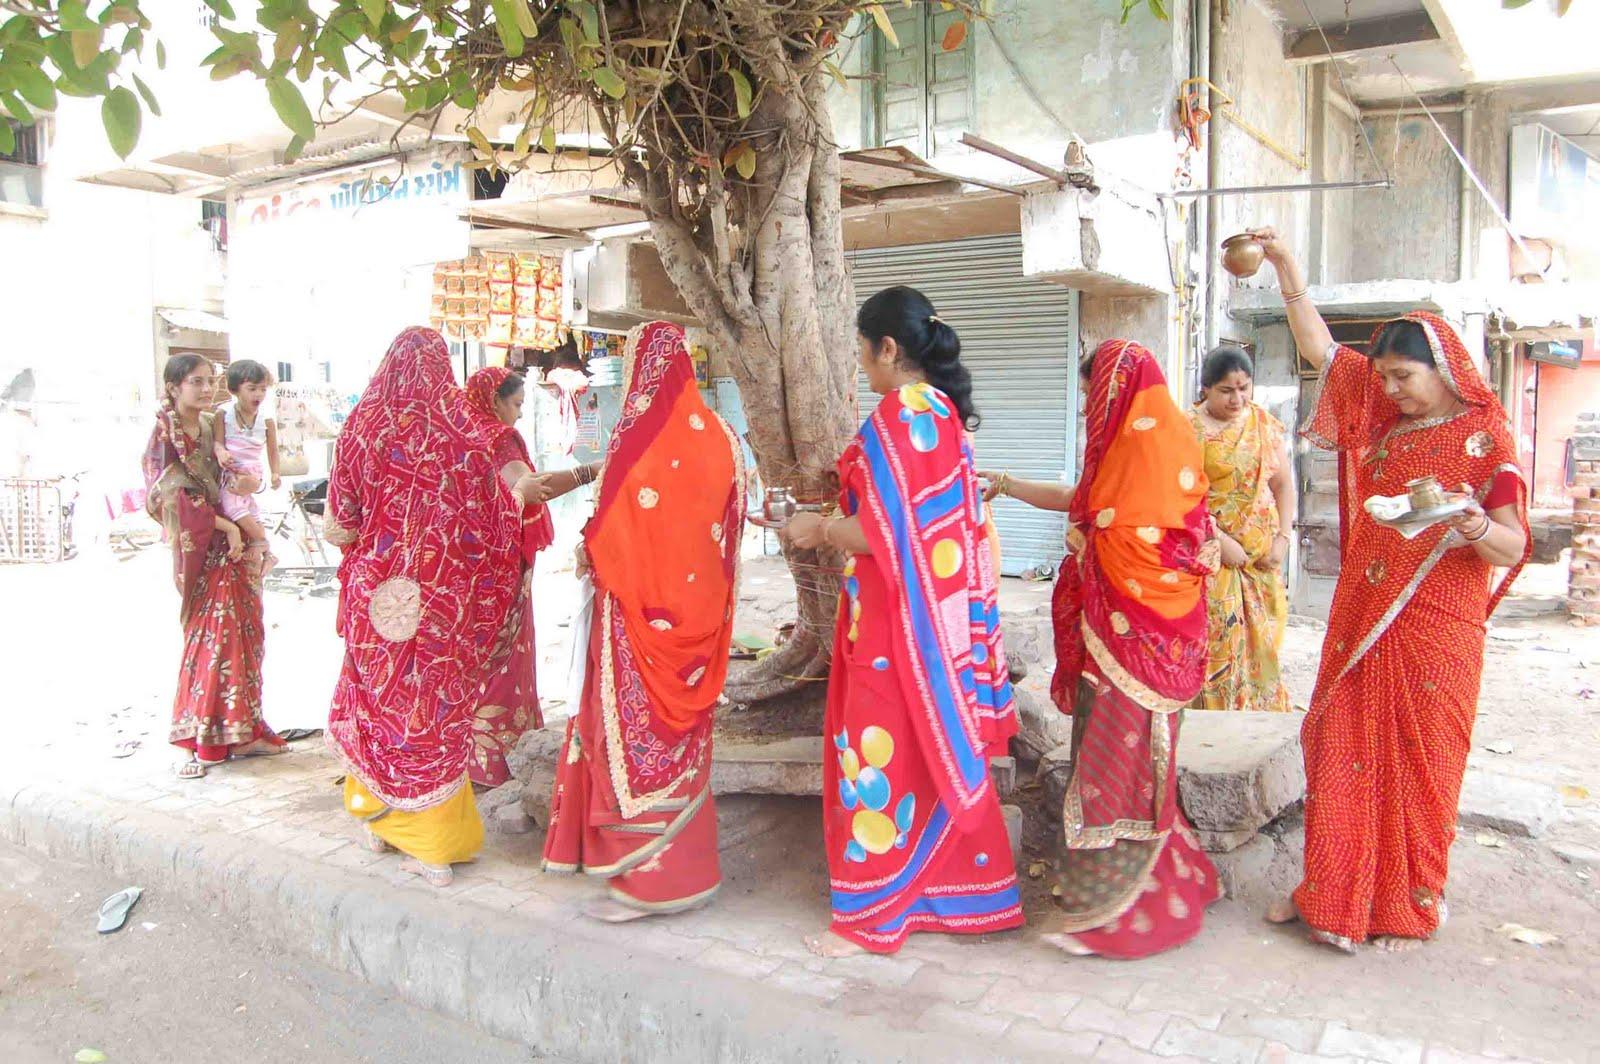 Savitri Savitri Married Gg: Krishna Sharanam: Vat Savithri Amavasi Vrat Observed In